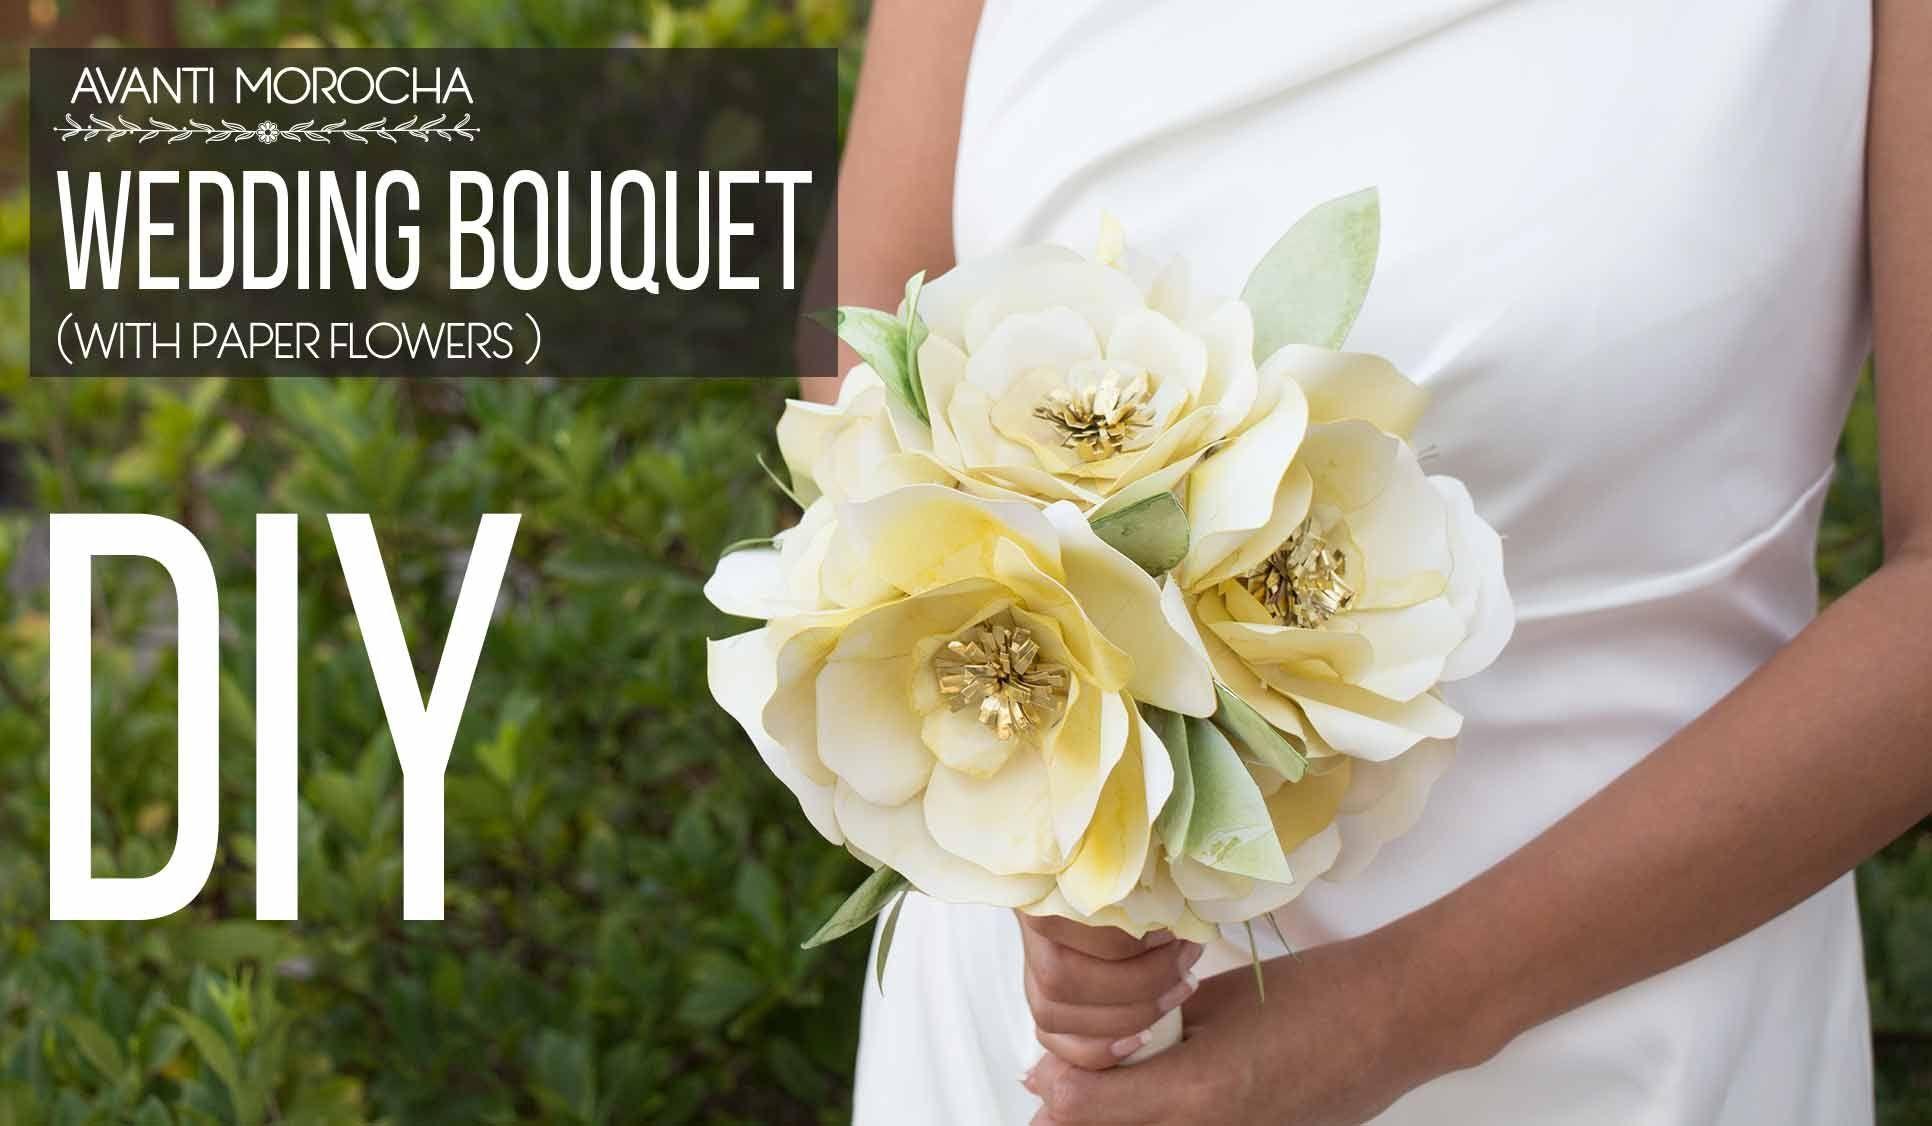 Diy wedding bouquet with paper flowers bouquet de novia con flores diy wedding bouquet with paper flowers bouquet de novia con flores de izmirmasajfo